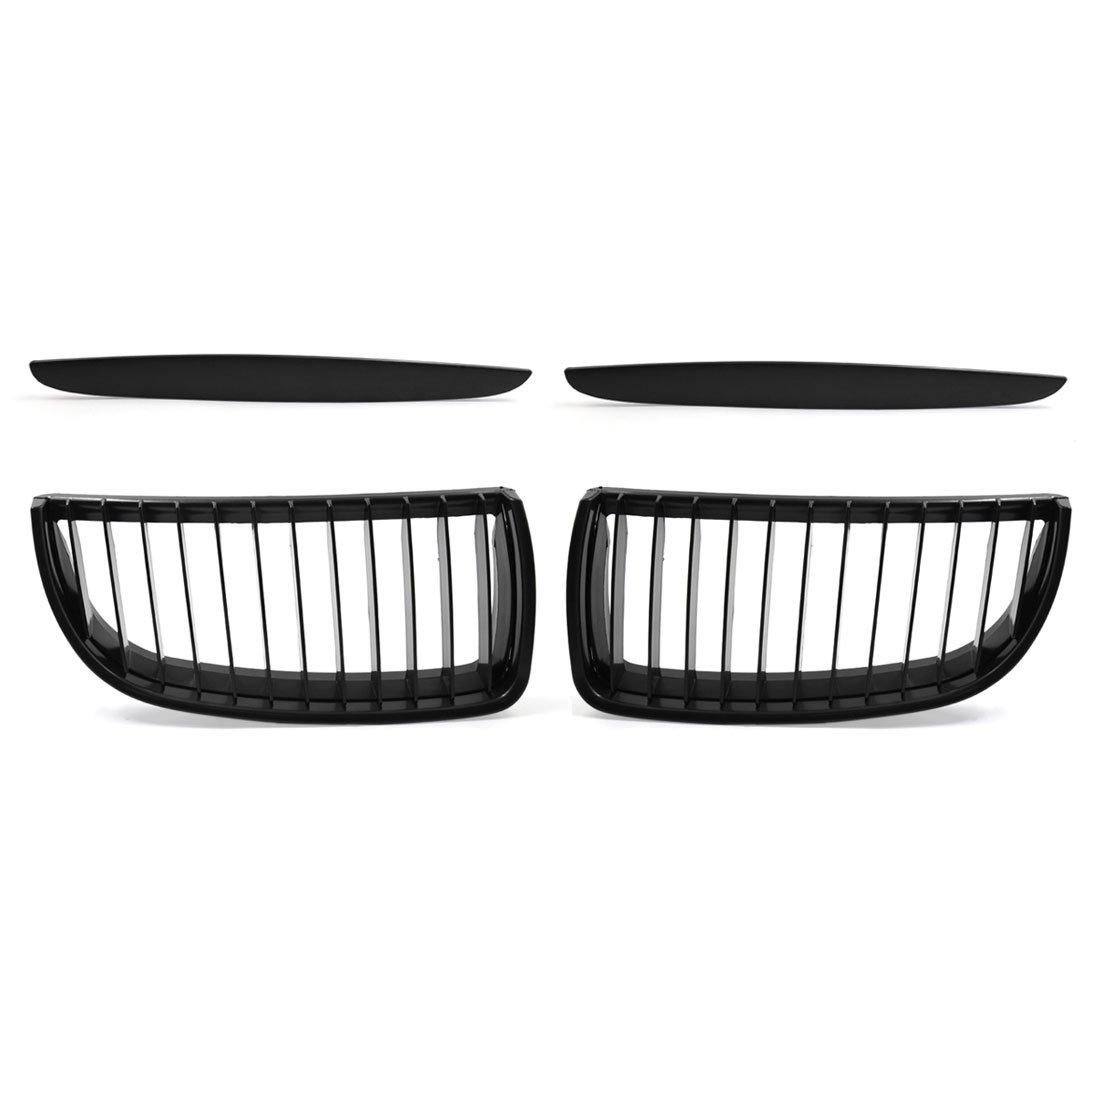 uxcell Car Matte Black Front Hood Kidney Grille Grill fit BMW E90 325i 328i 328xi 335i 335xi 330i 330xi a17072900ux0115